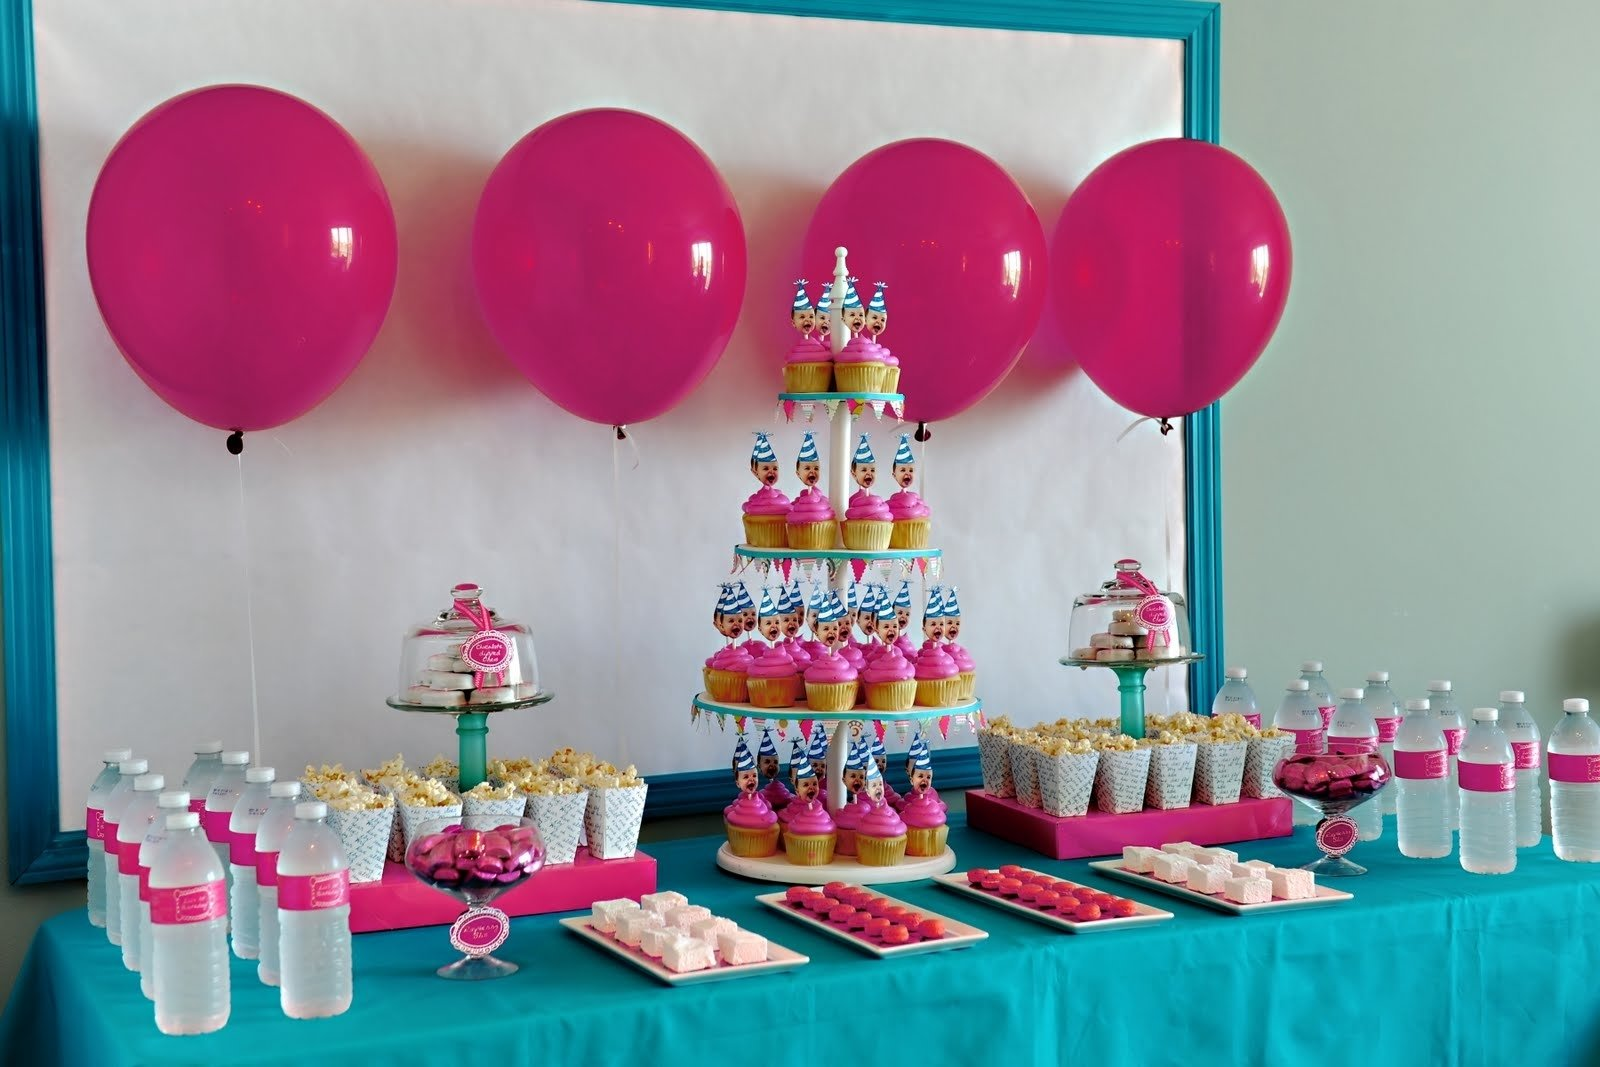 10 Stylish 11 Year Old Party Ideas themes birthday awesome 8 year old birthday party ideas plus 8